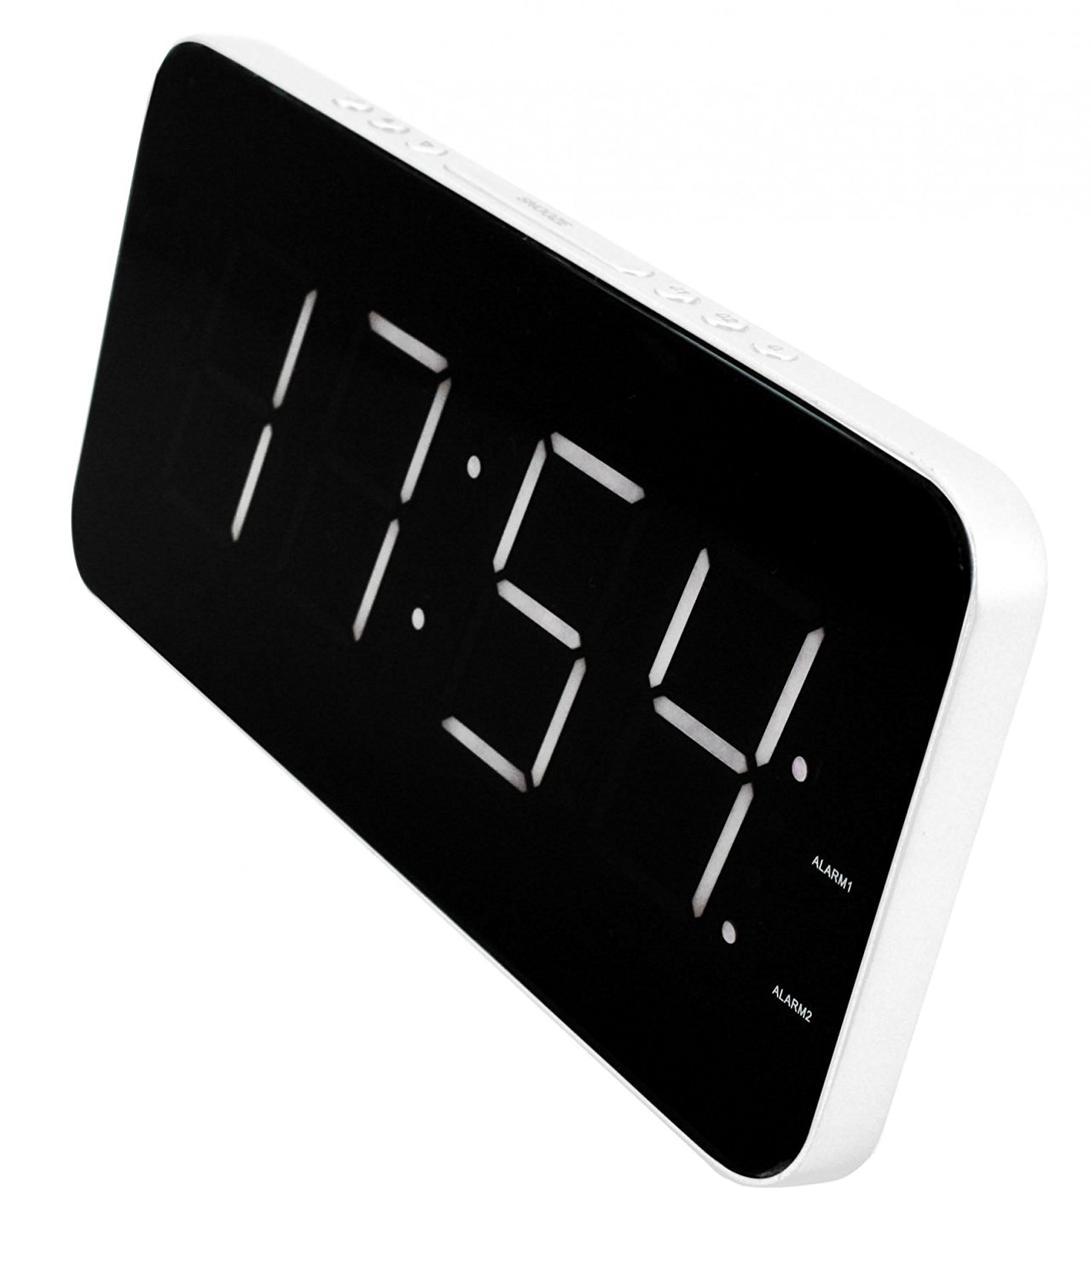 Soundmaster ur8900s Часы +будильник Уценка 10141601